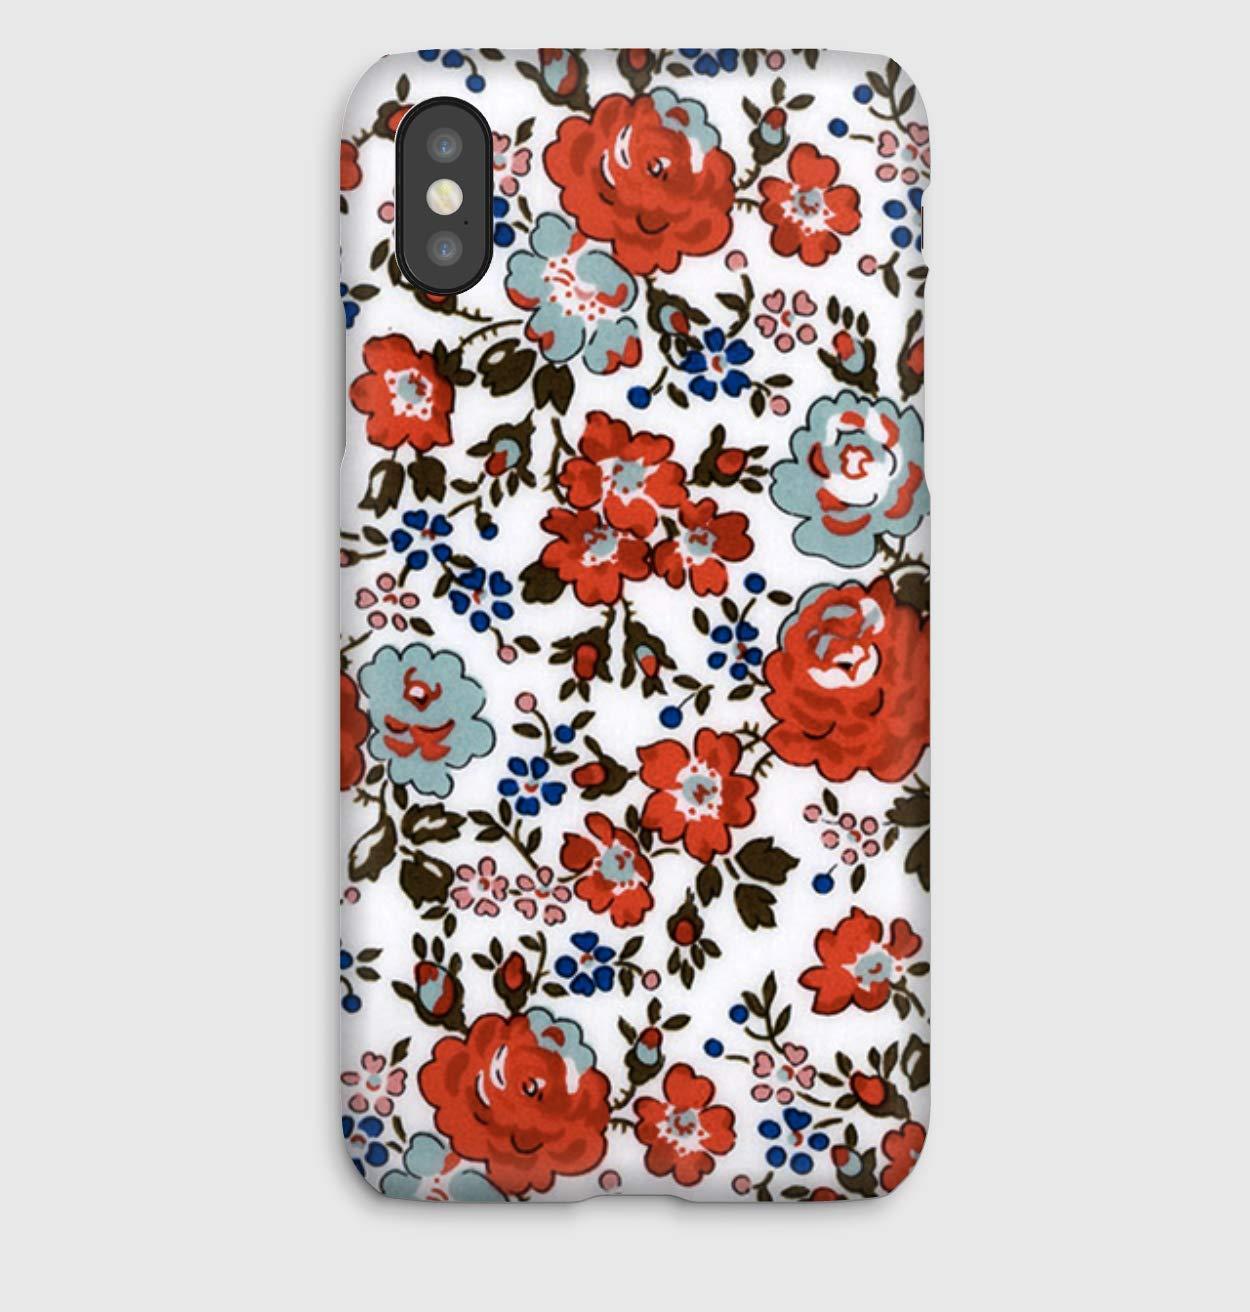 Liberty Felicite Corail, coque pour iPhone XS, XS Max, XR, X, 8, 8+, 7, 7+, 6S, 6, 6S+, 6+, 5C, 5, 5S, 5SE, 4S, 4,